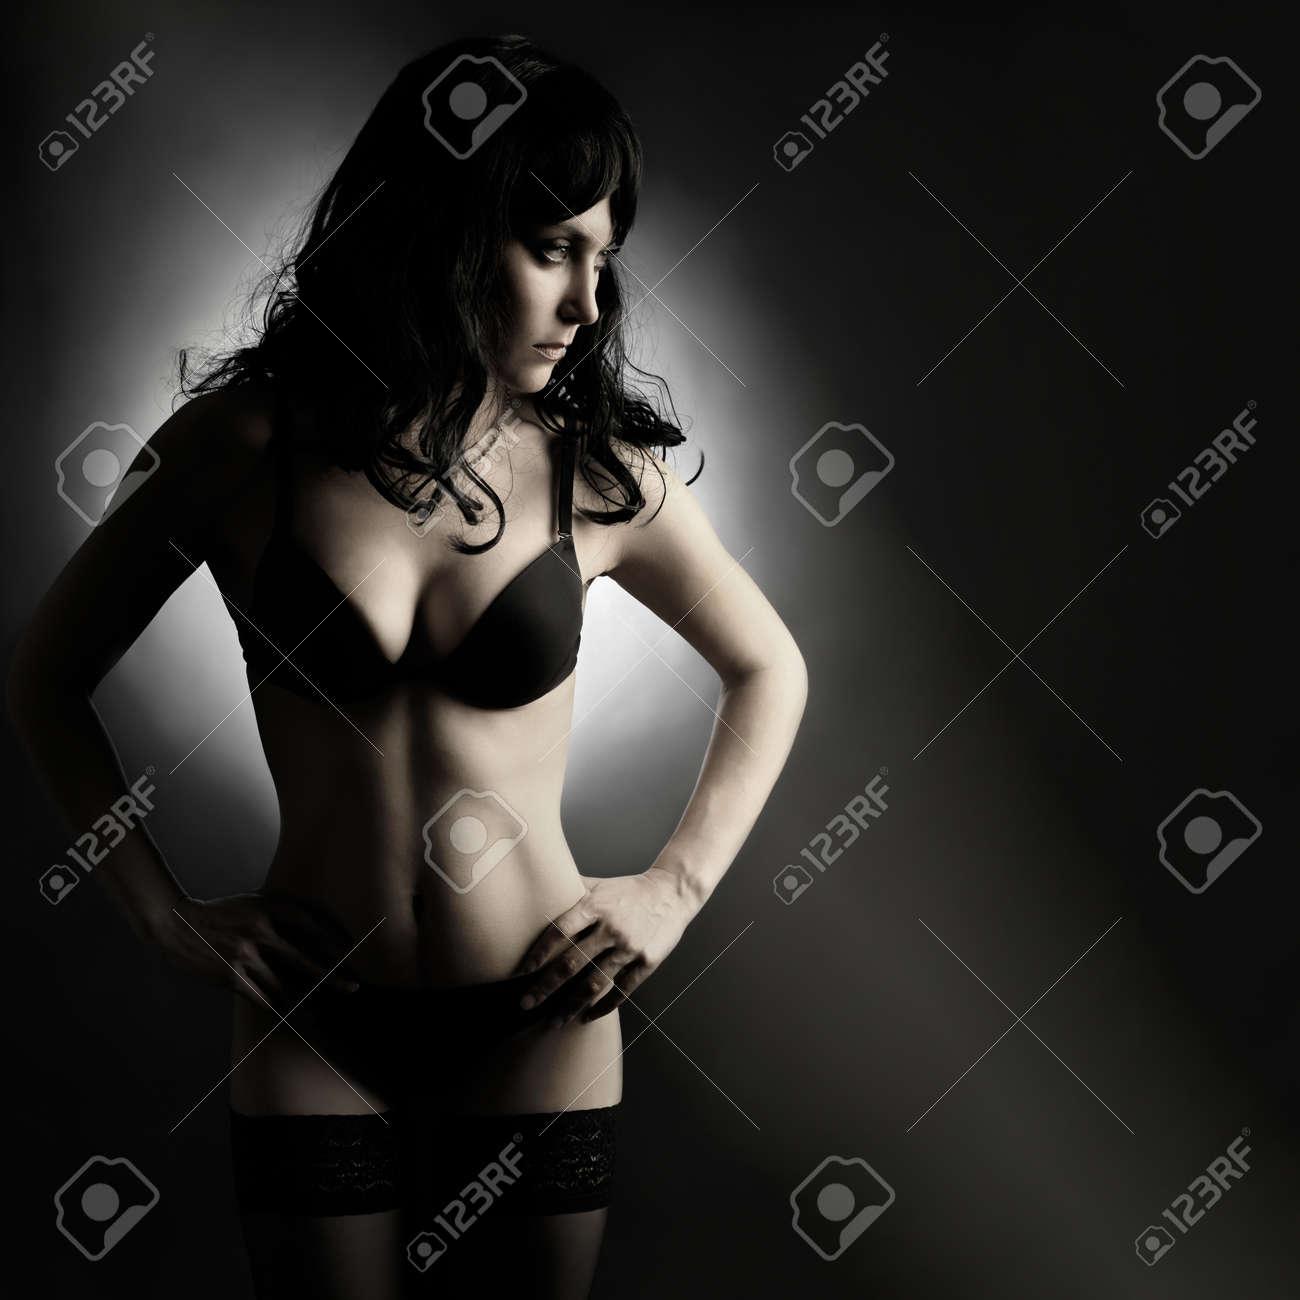 Sexy fashion woman in lingerie portrait. Black elegant underwear Stock Photo - 12576061